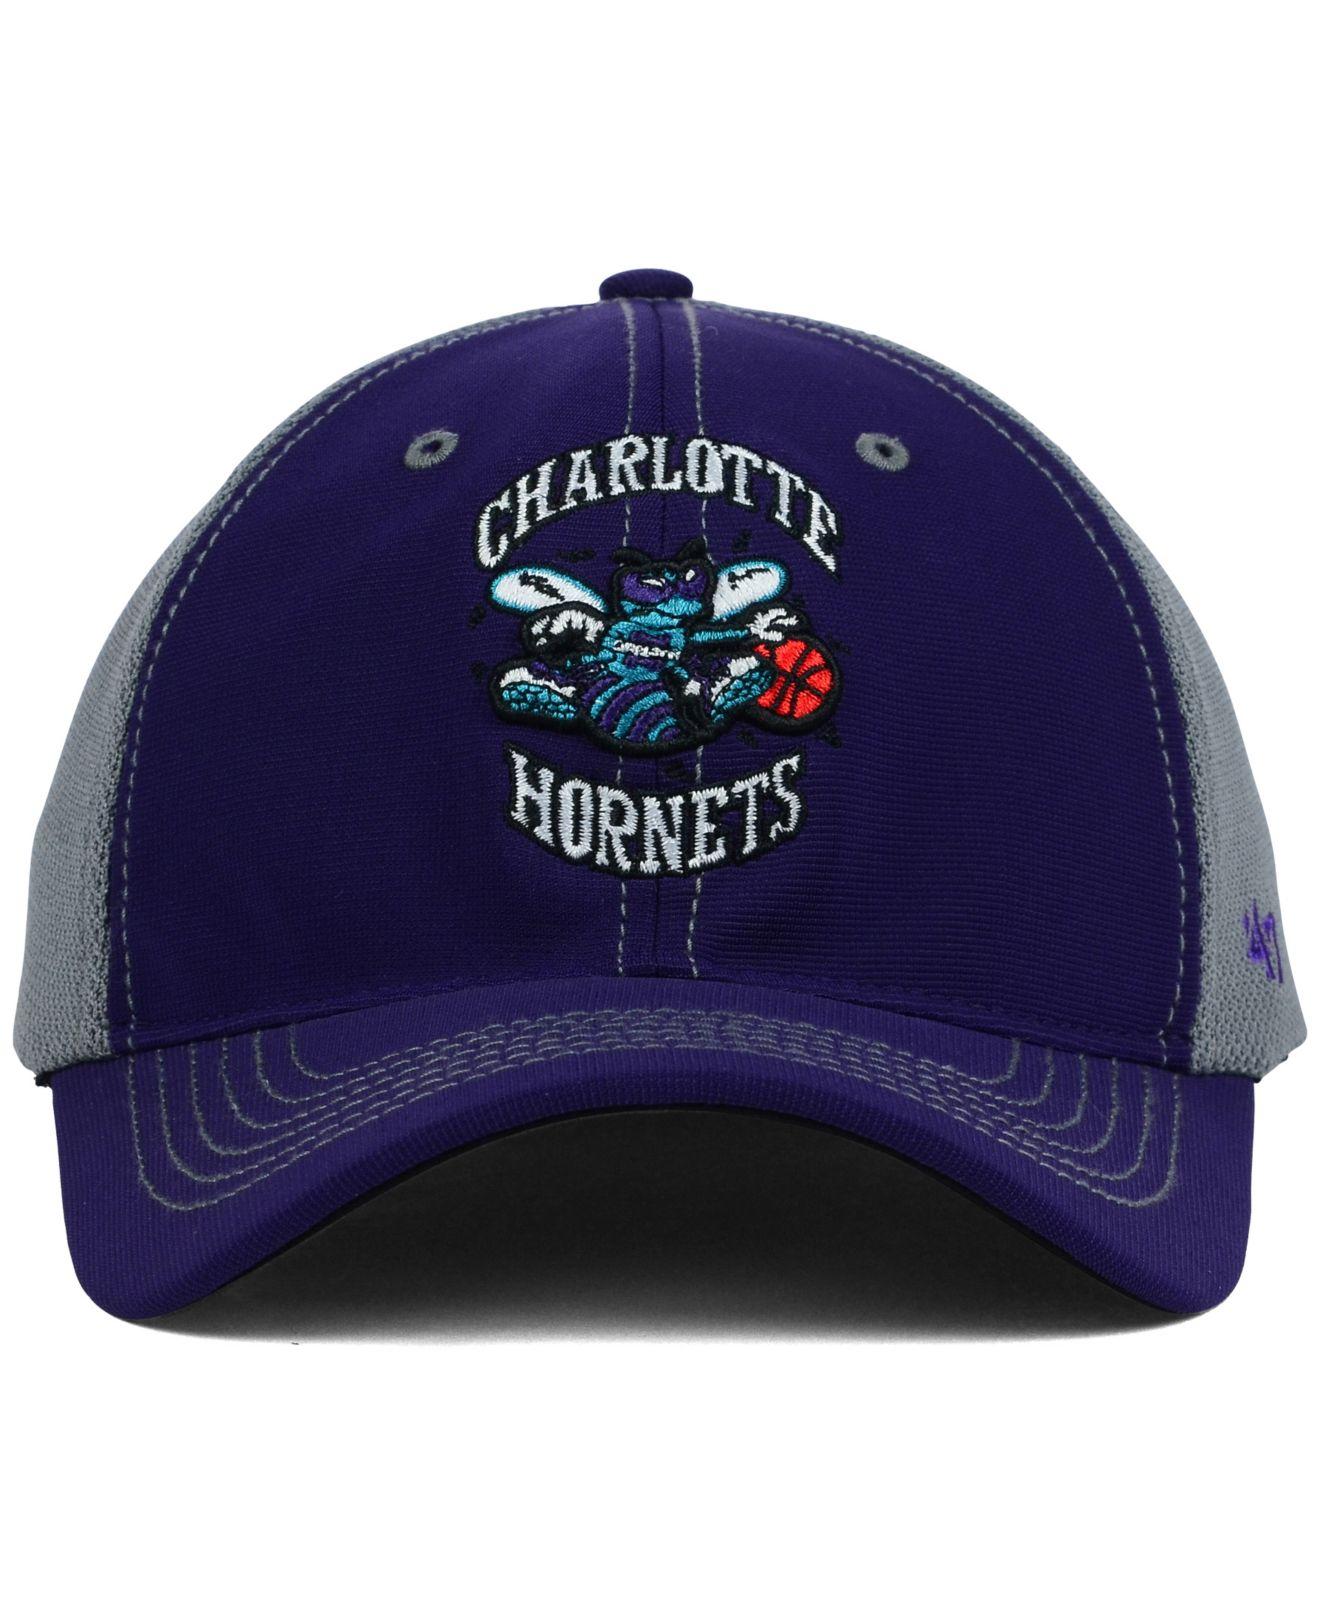 ... shot snapback cap 80d9e 34fb4  canada lyst 47 brand charlotte hornets  reversal team color 47 closer cap baba9 131dc d89094e289fb